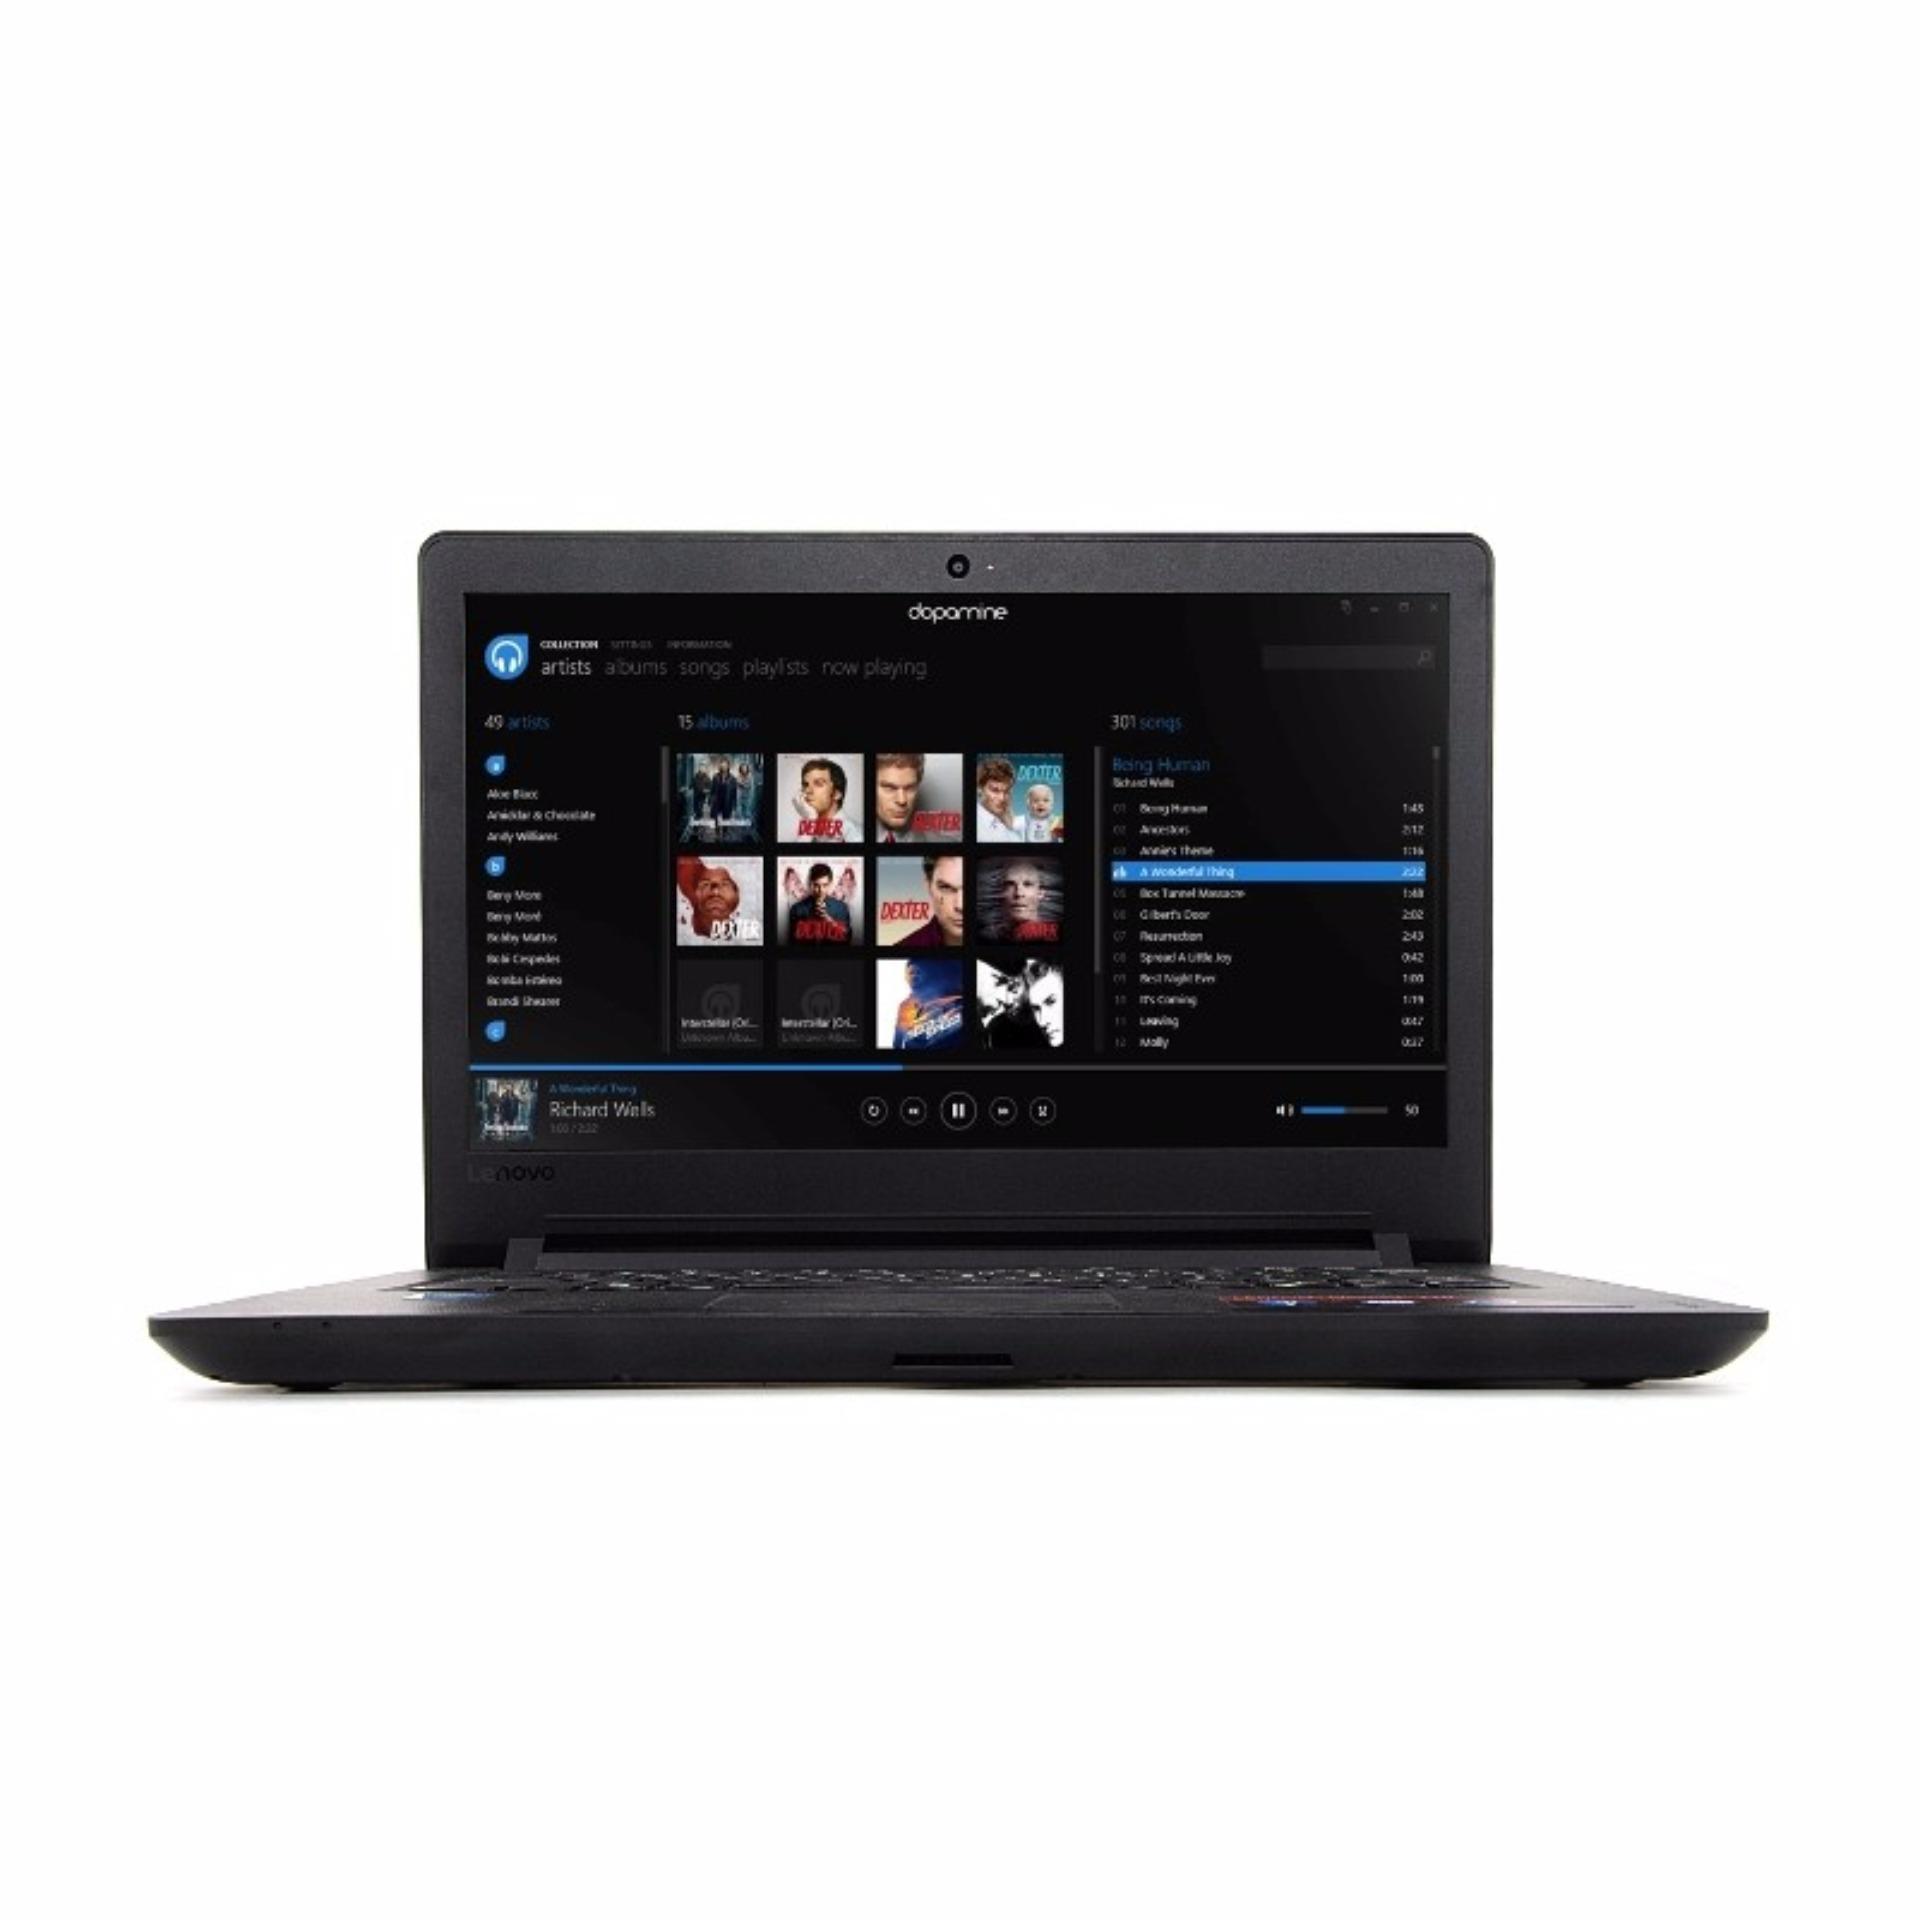 116 Info Harga Berbagai Produk Terbaik Asus Rog Gl 552 X Dm409t Core I7 7700 4096mb 1tb N Vidia Gtx950 Laptop Lenovo Ip110 8gid N30600 4gb 14 Black Texture